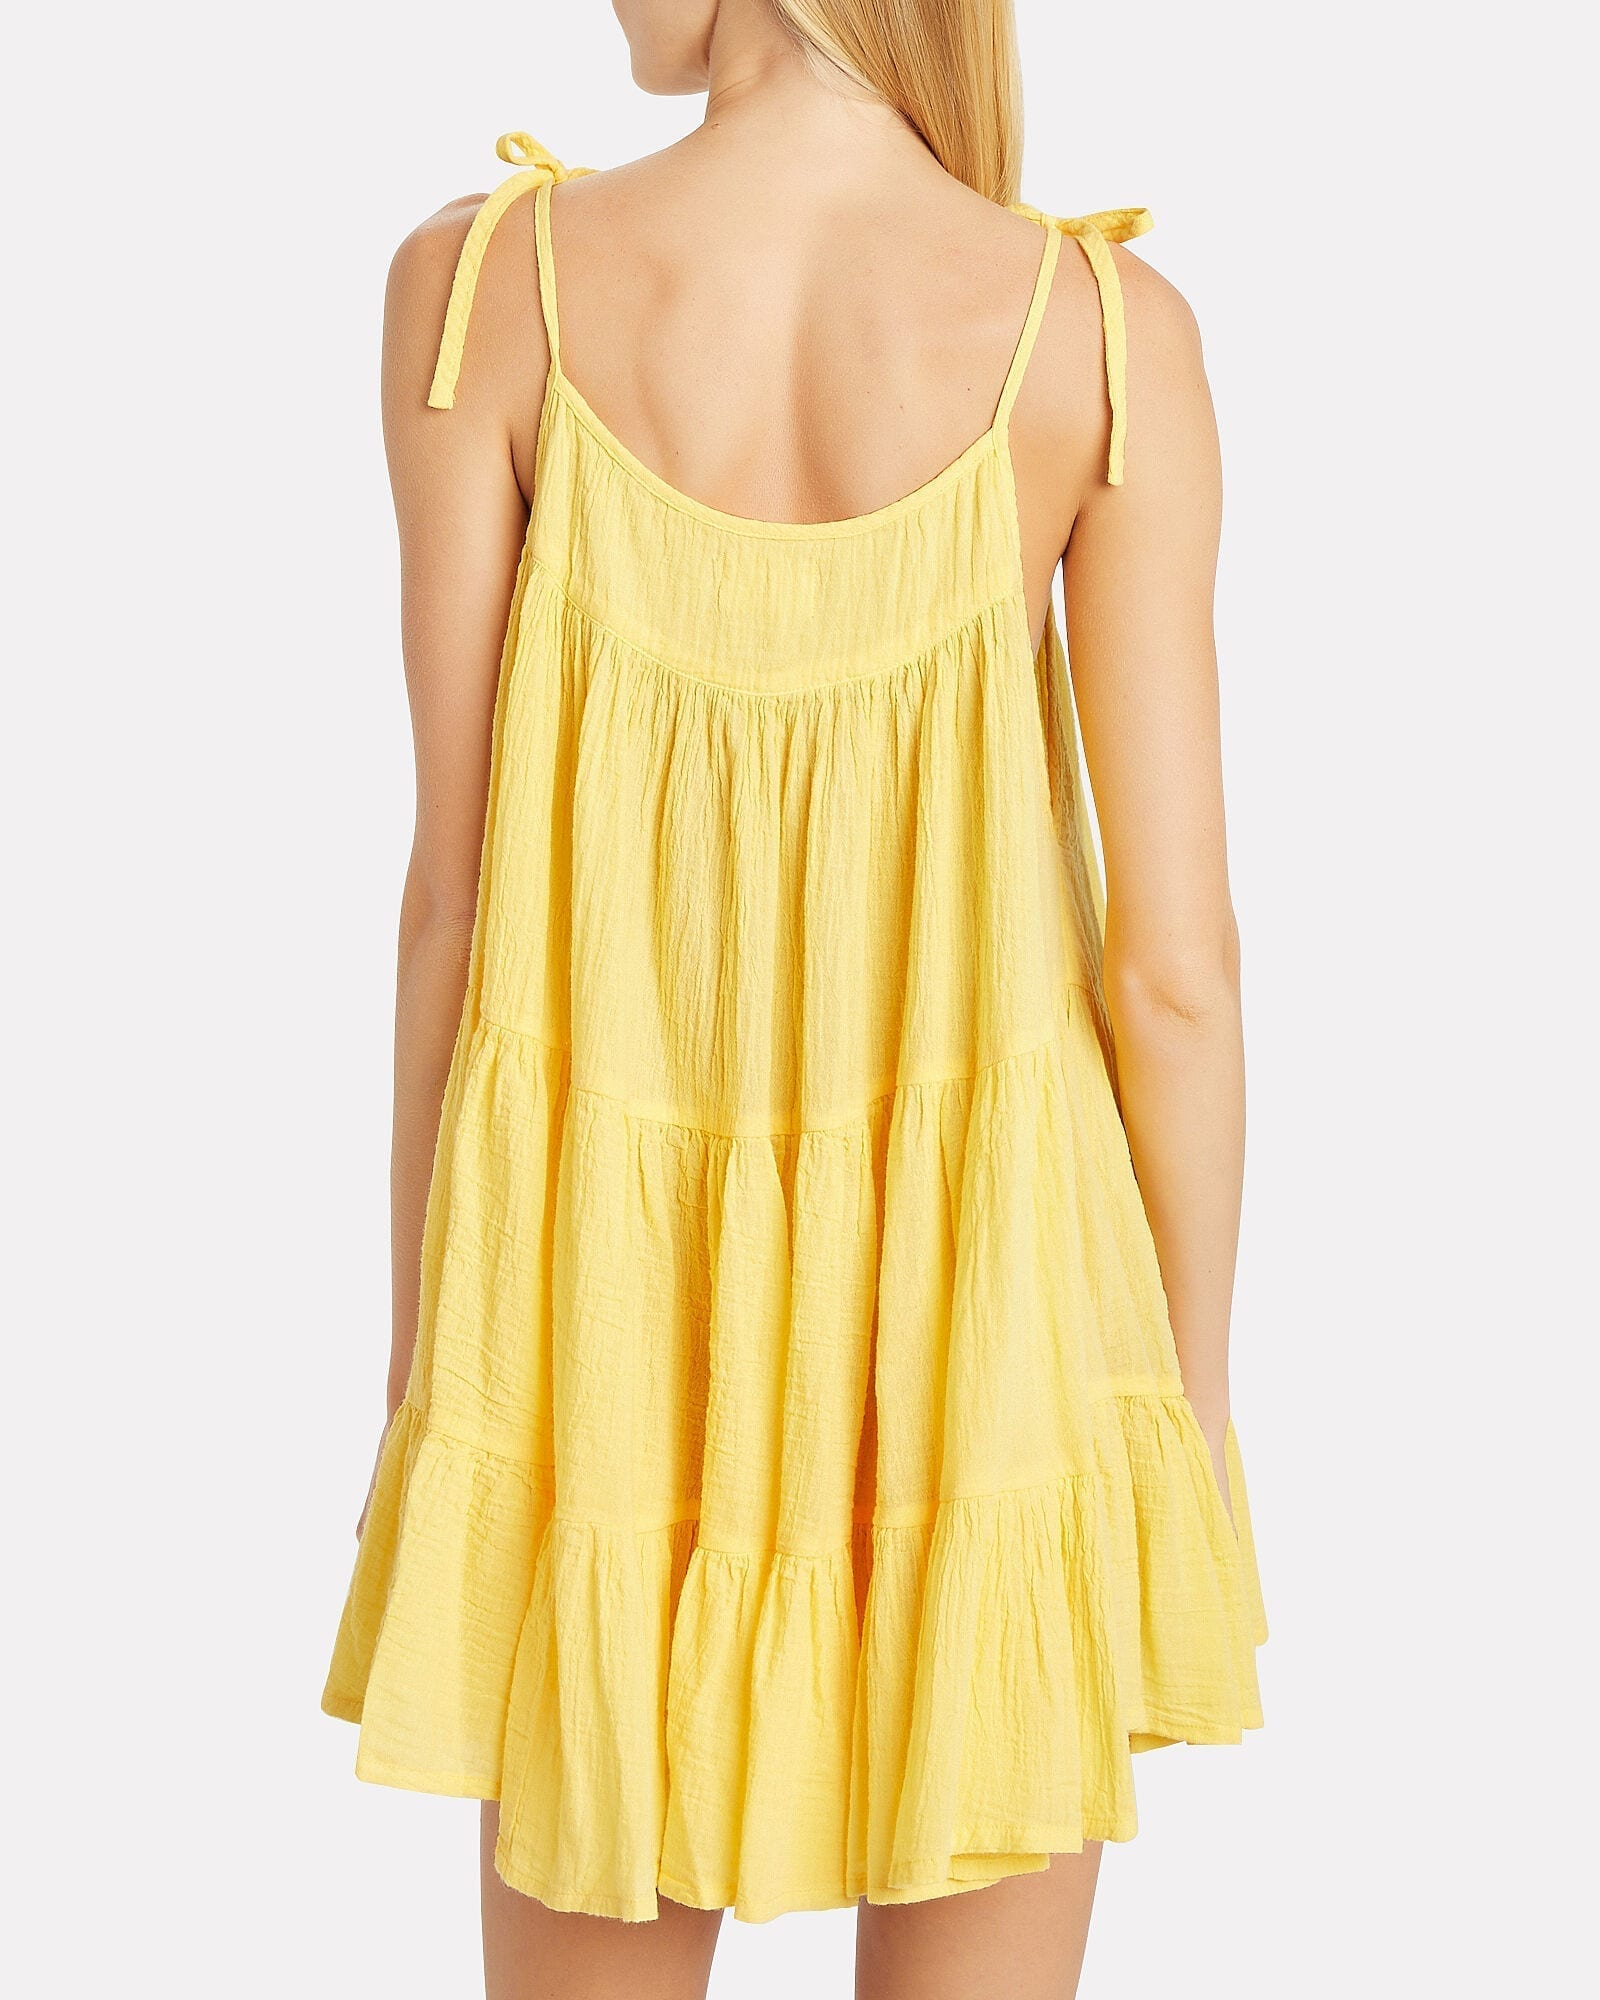 HONORINE Peri Cotton Tent Dress